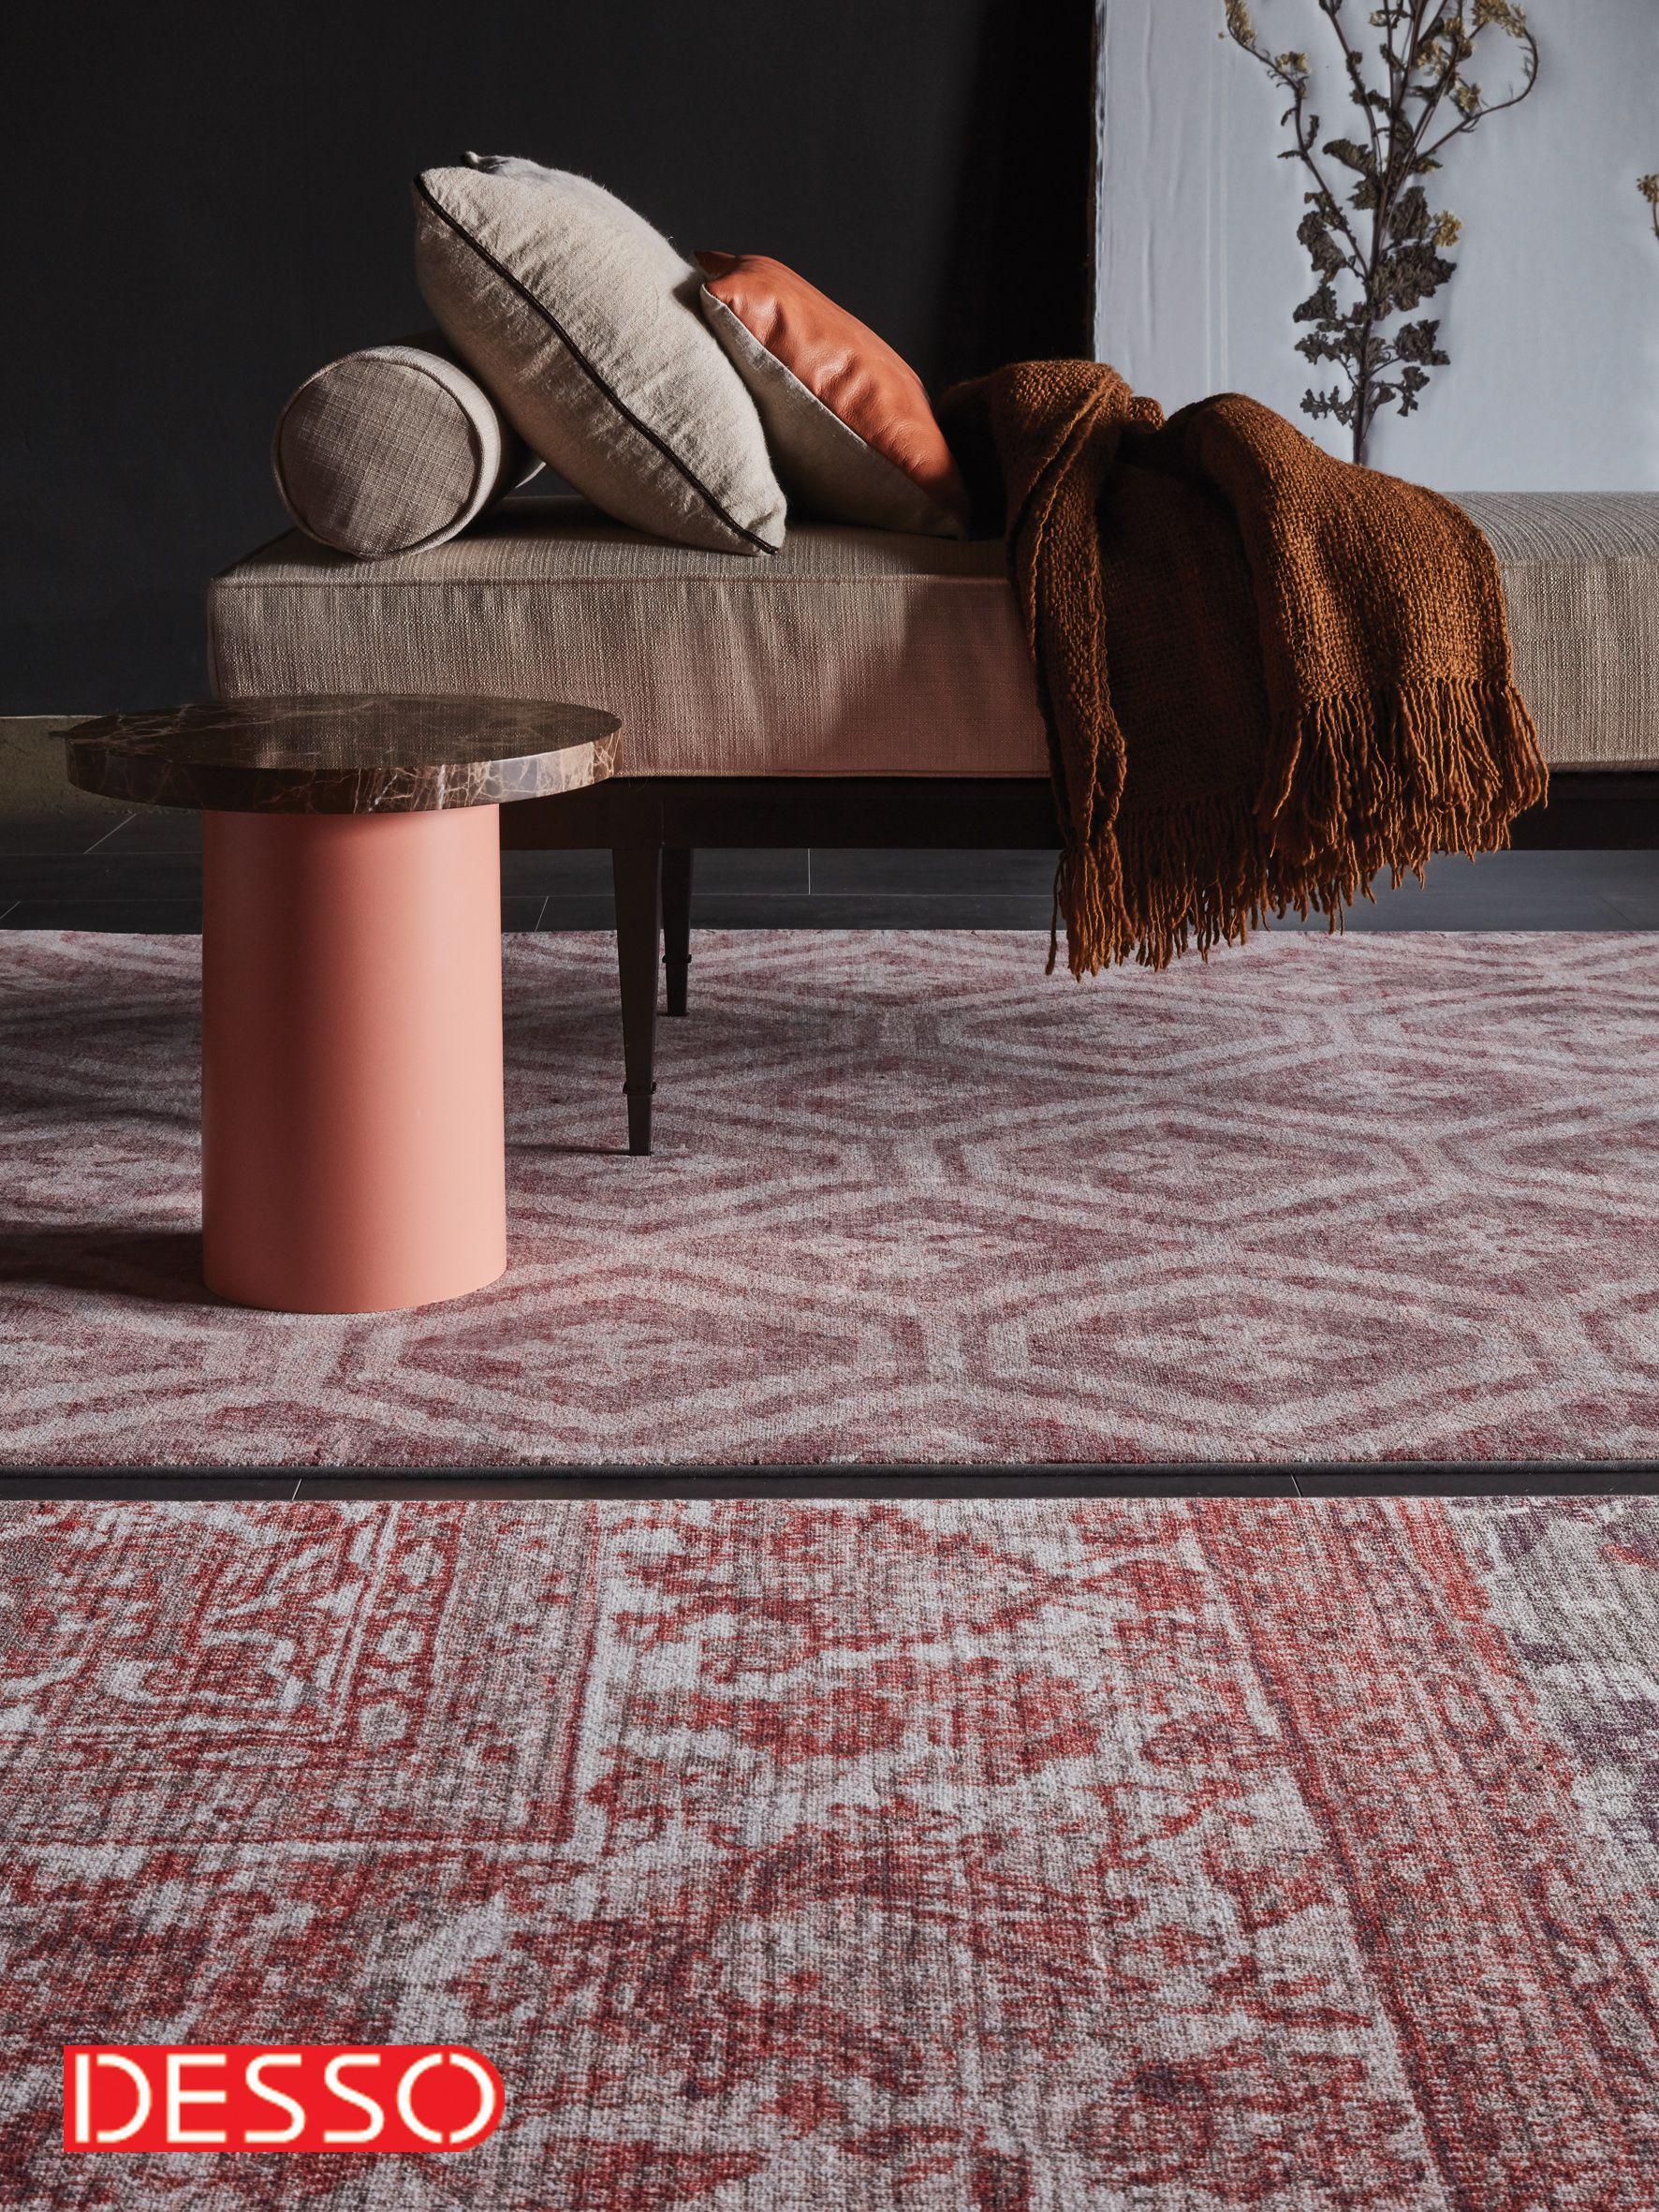 tapijt desso ex timmermans indoor design